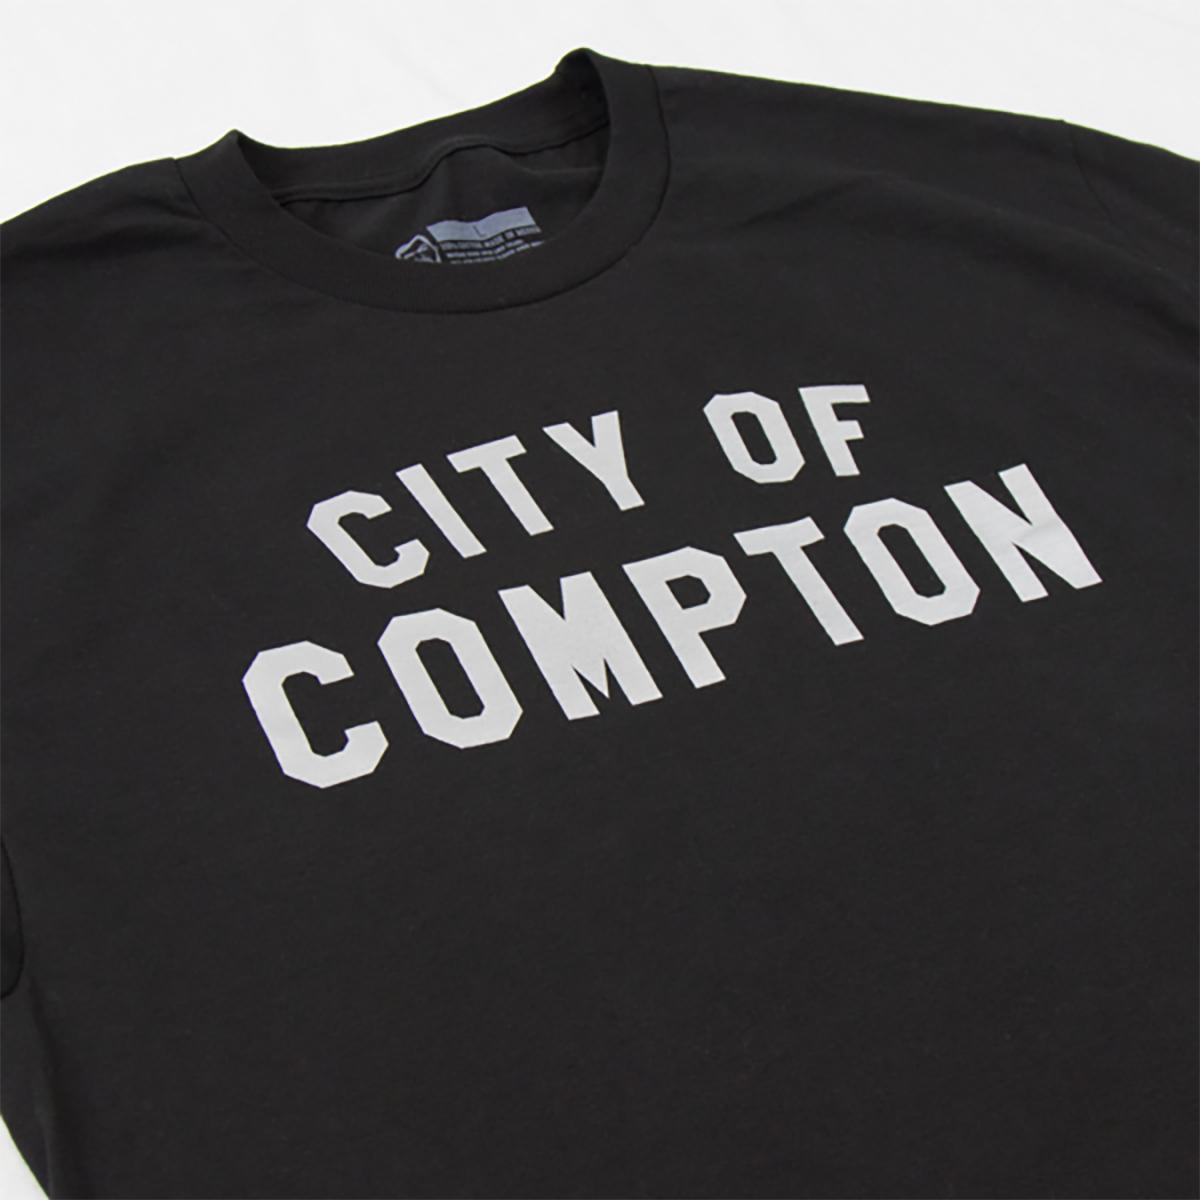 3M Reflective City of Compton Tee